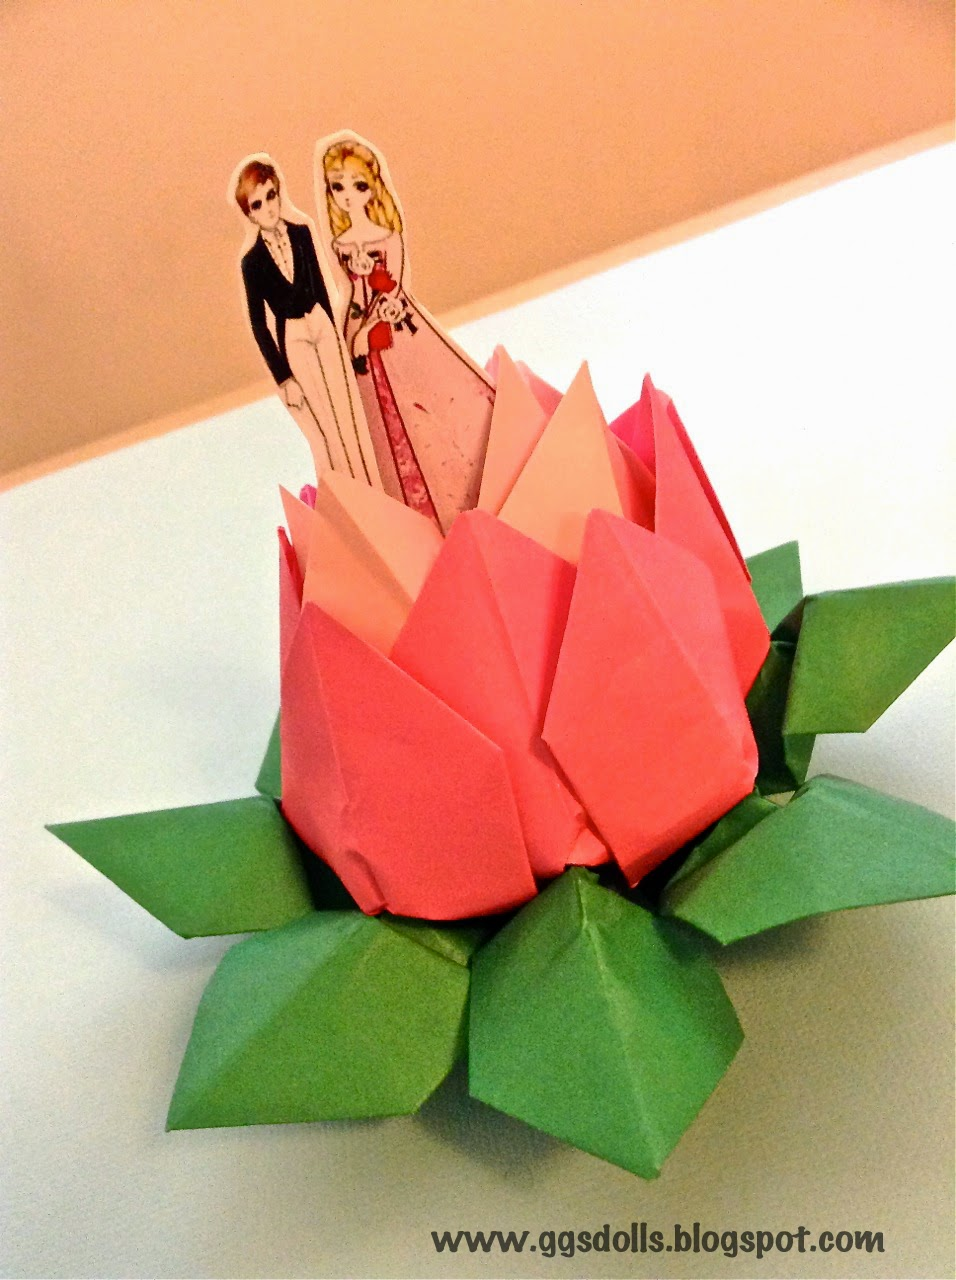 ggsdolls: Some Origami Fun!! - photo#20